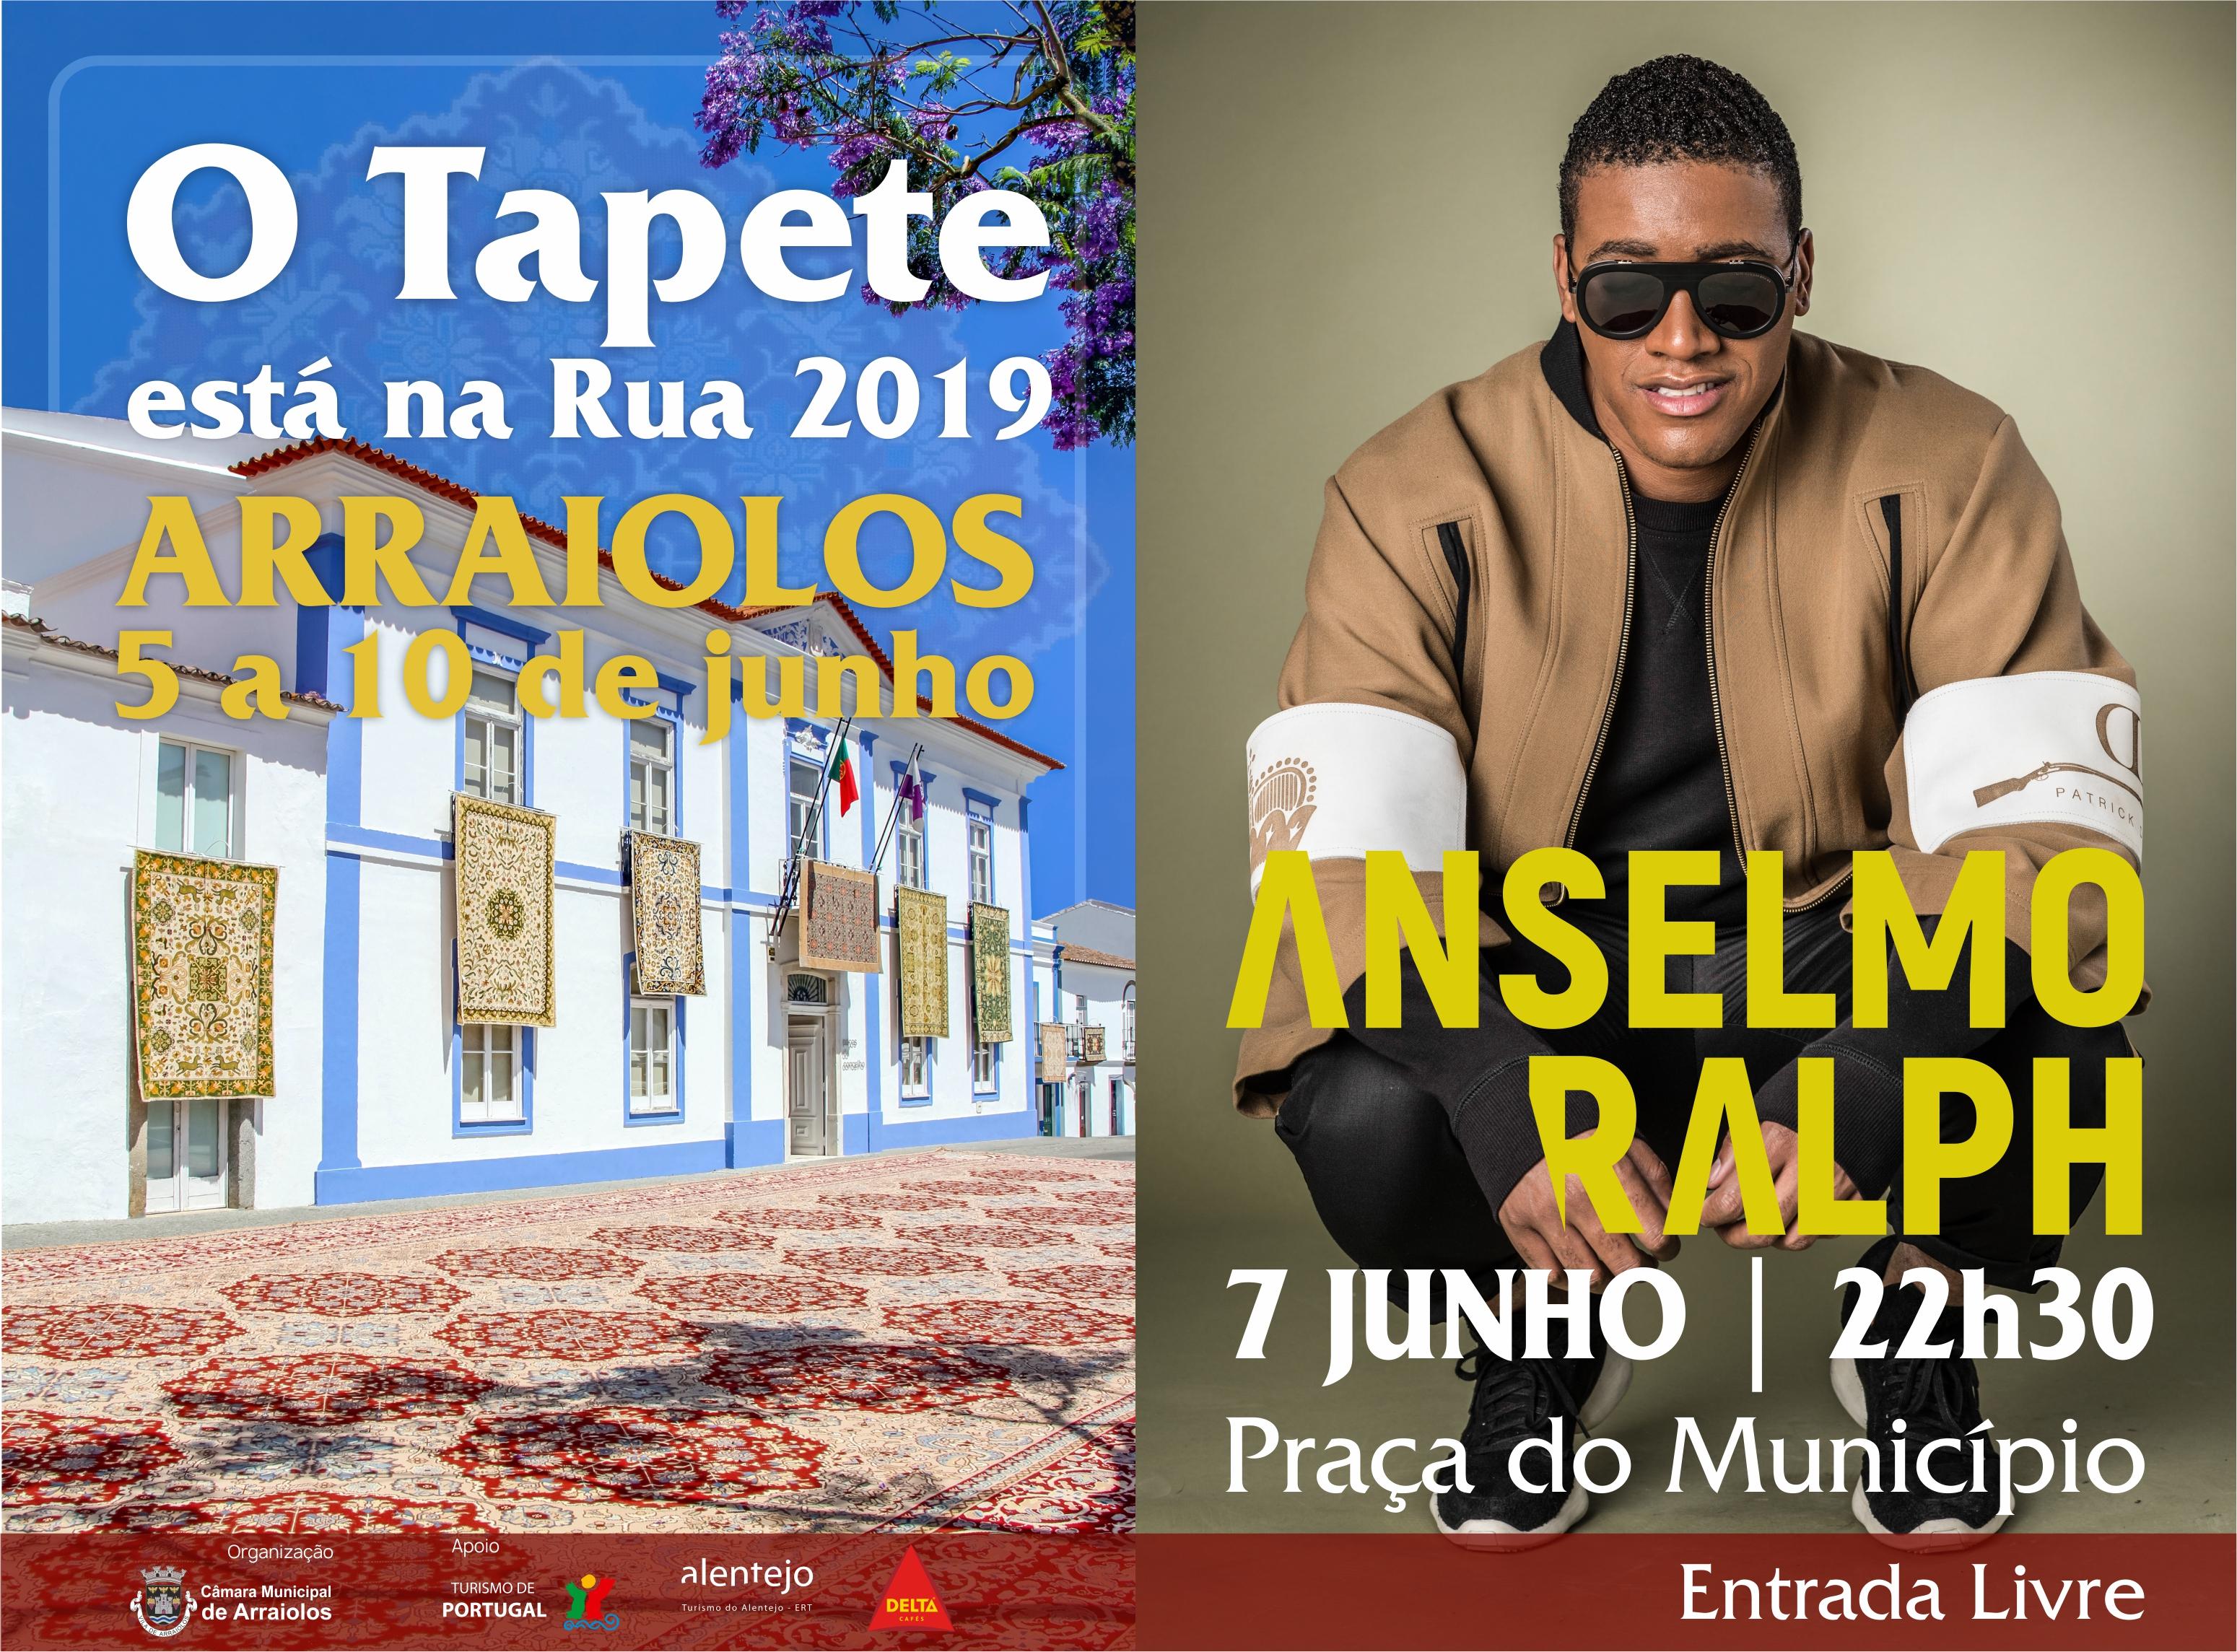 Anselmo Ralph Tapete Rua 2019.jpg